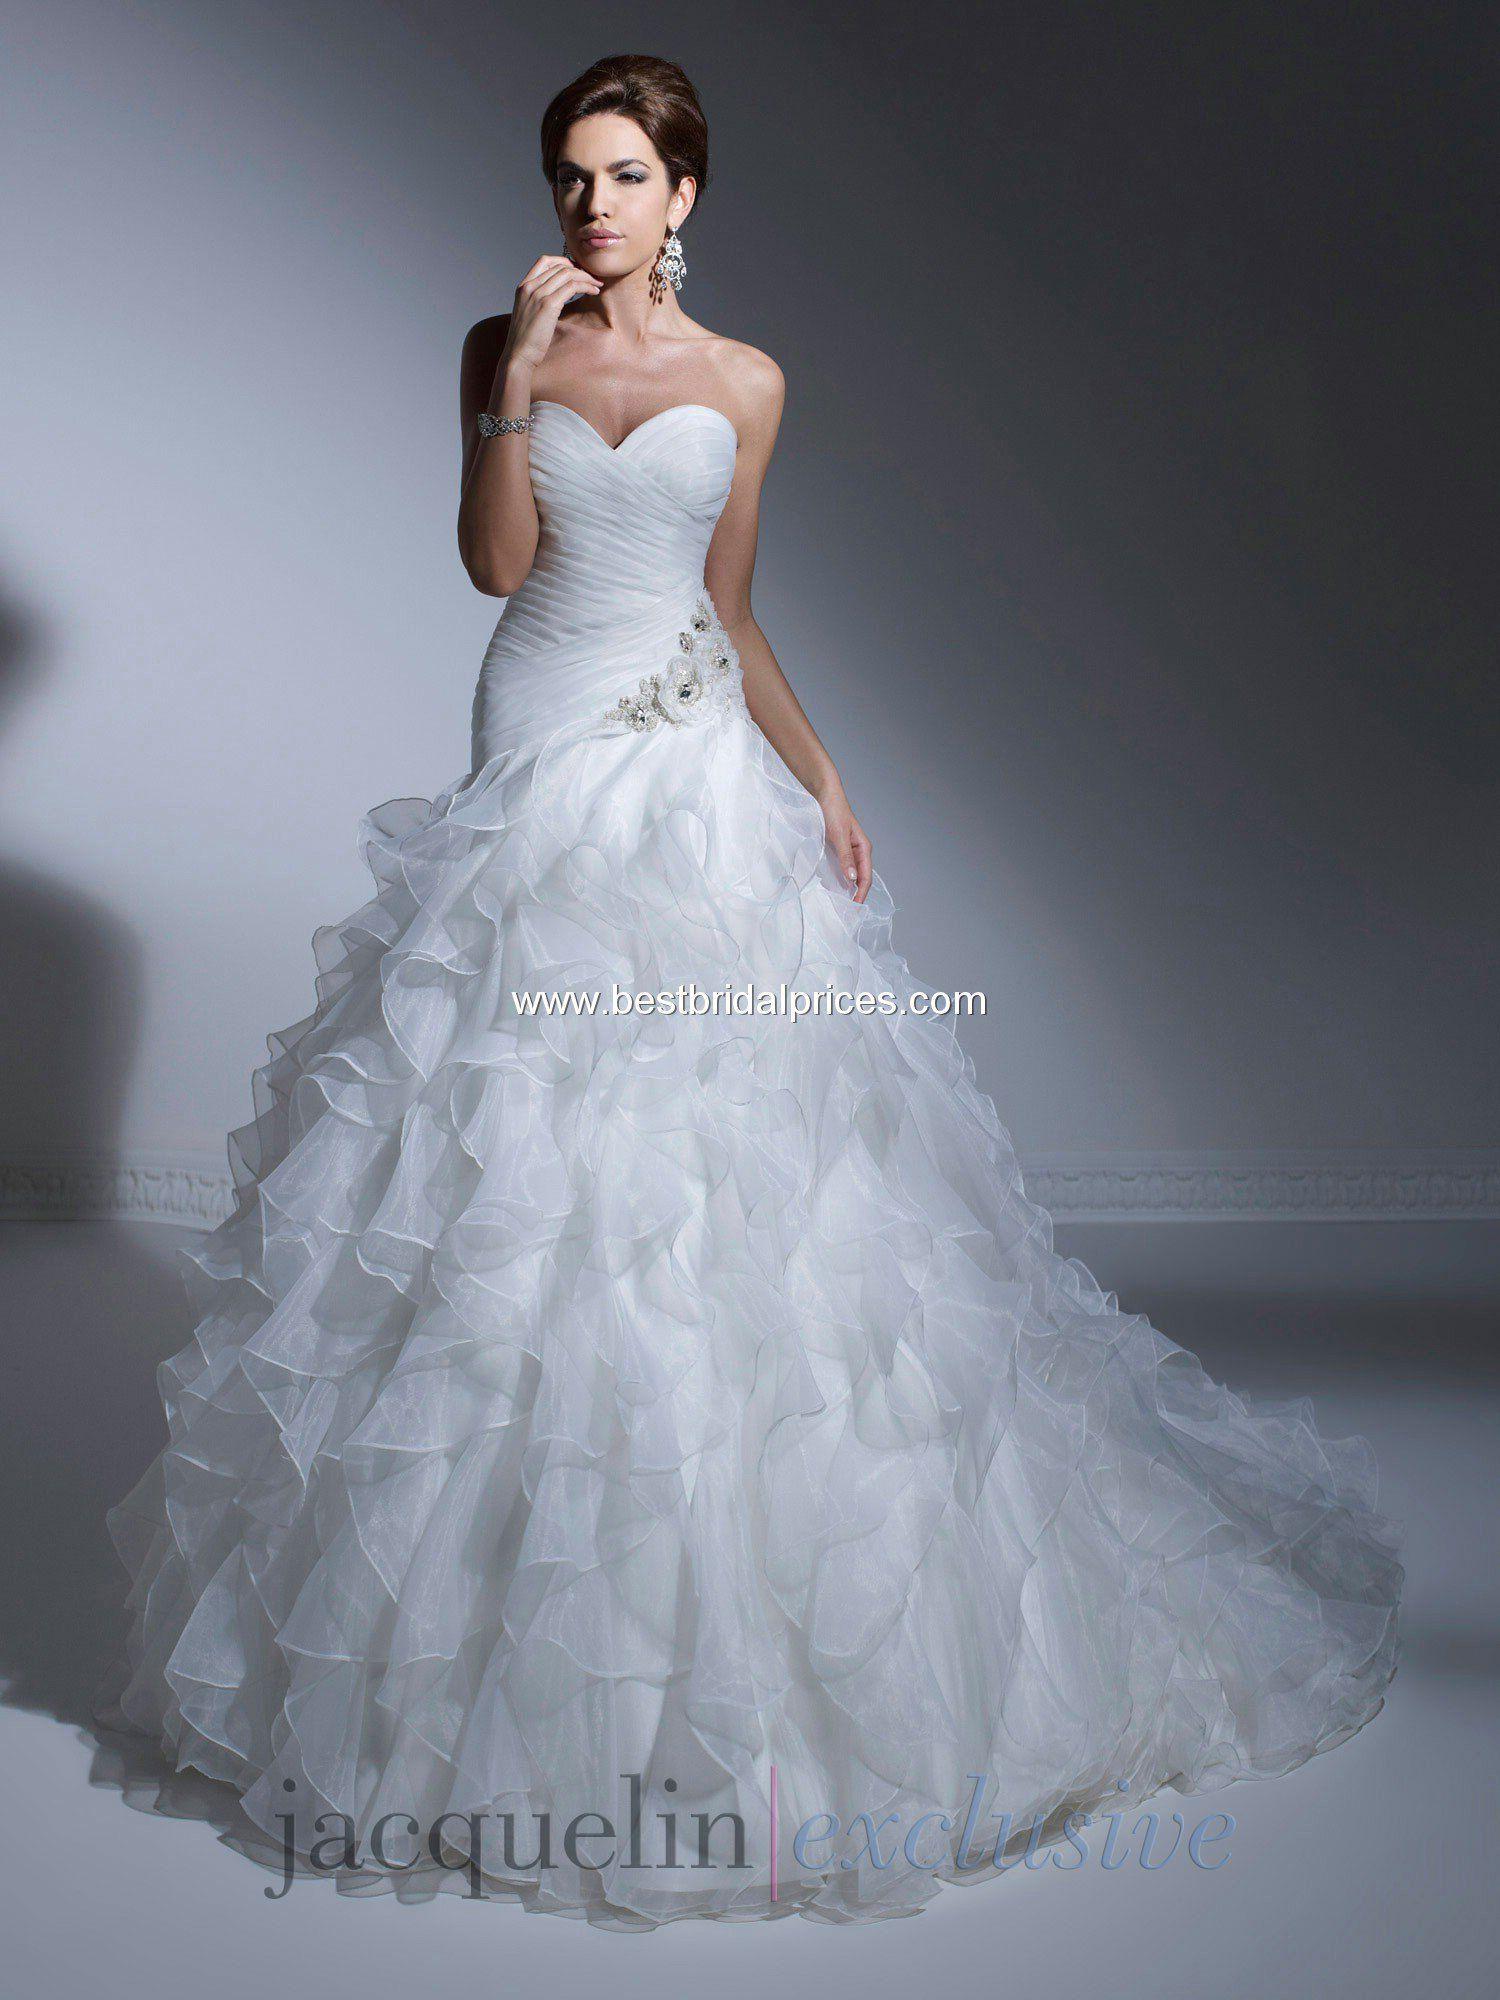 Jacquelin Wedding Dresses - Style 19912 | fairy tale | Pinterest ...